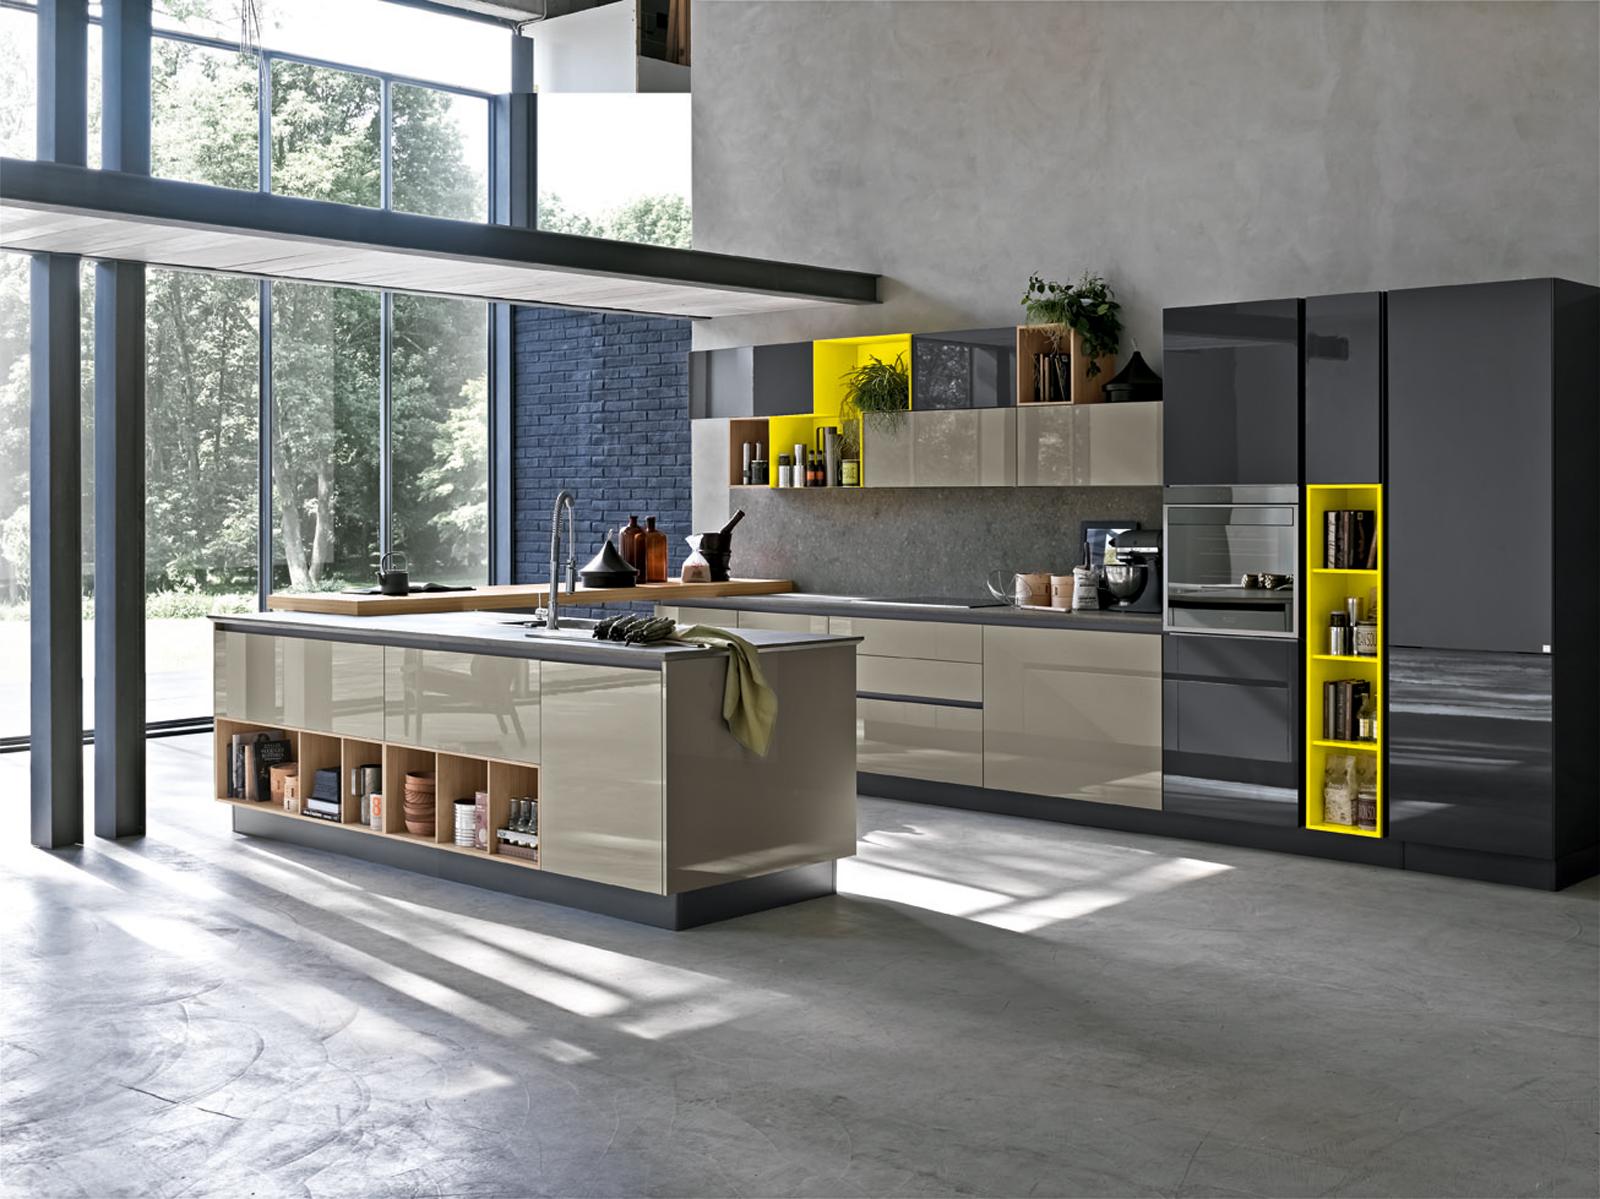 Cucina stosa alev for Stosa cucine verona